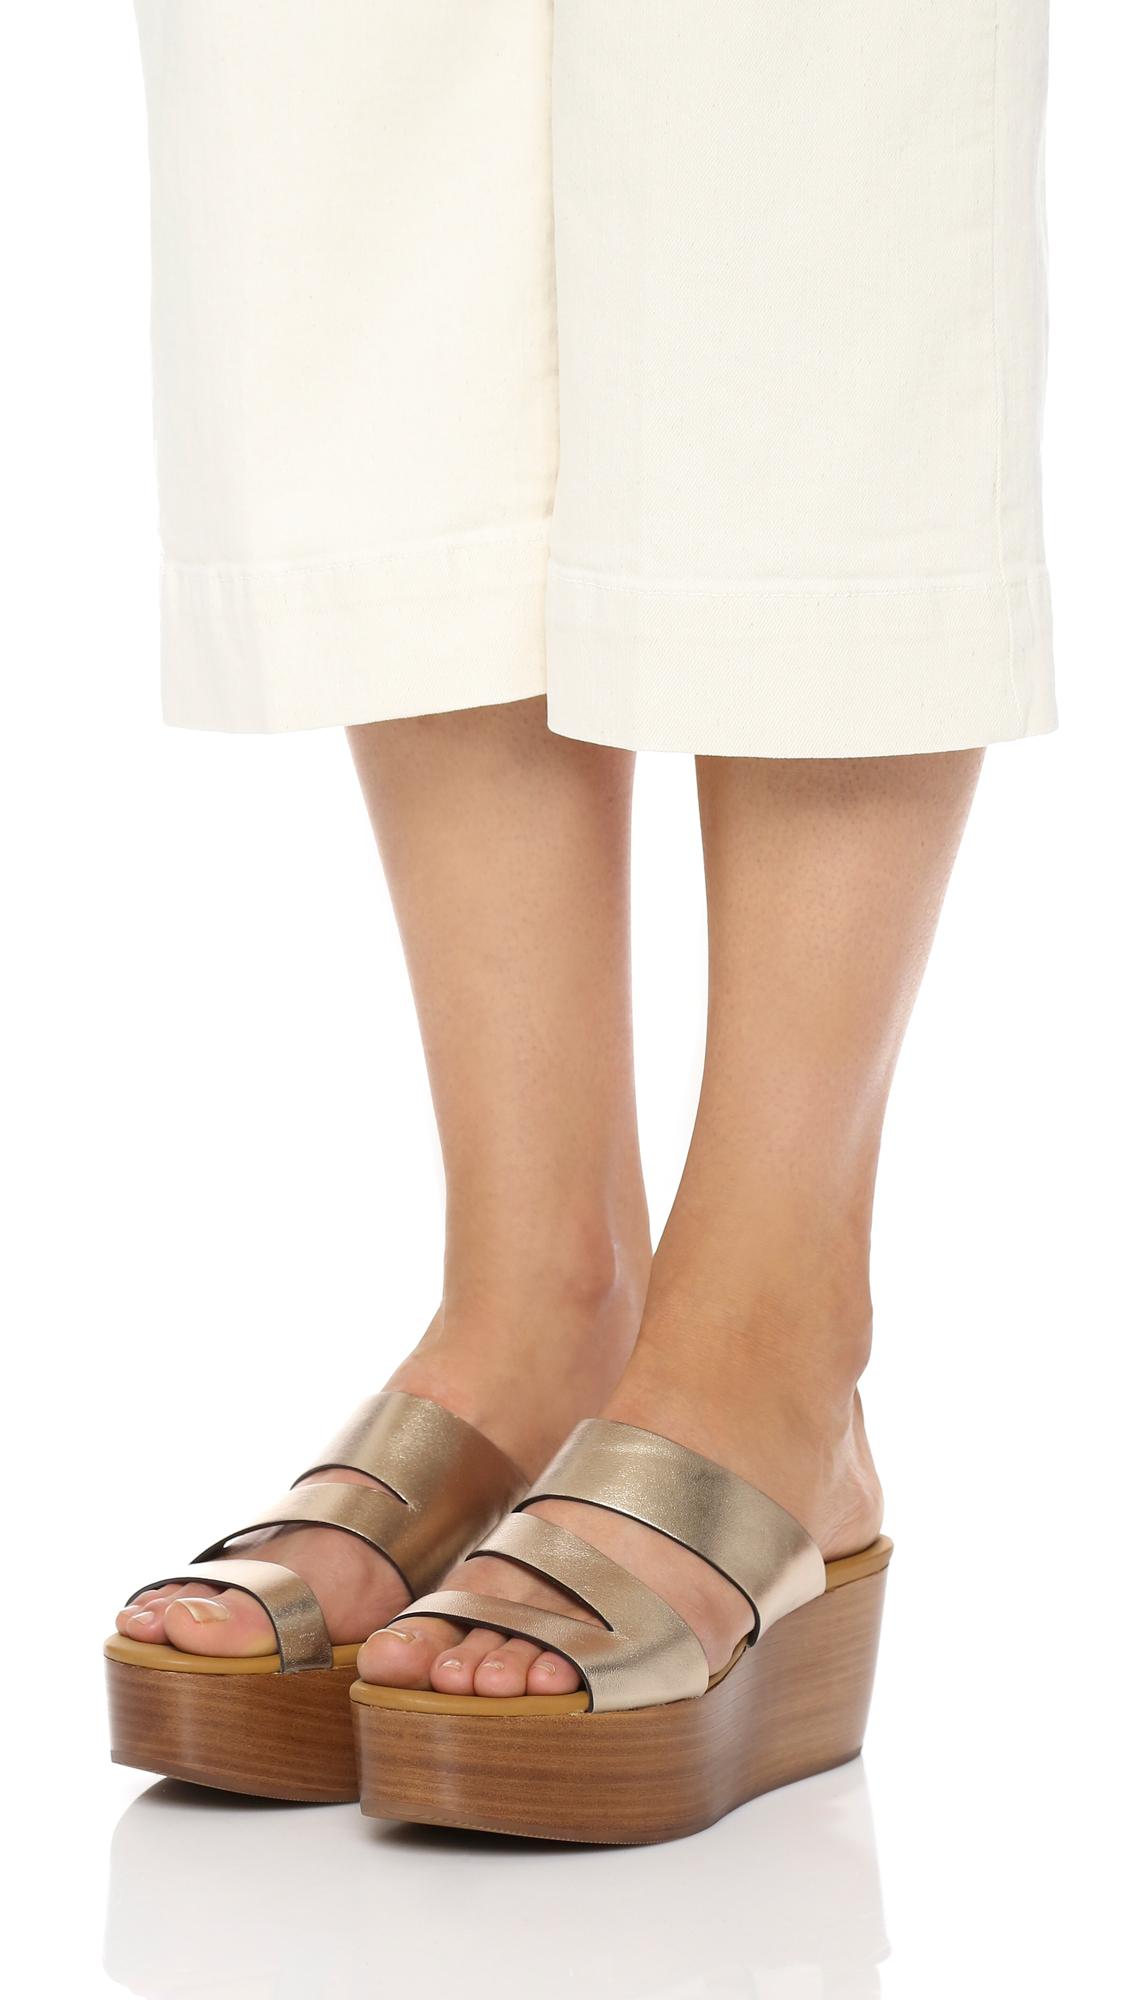 ccfdb5923494 See by Chloe Dania Platform Wedge Sandals